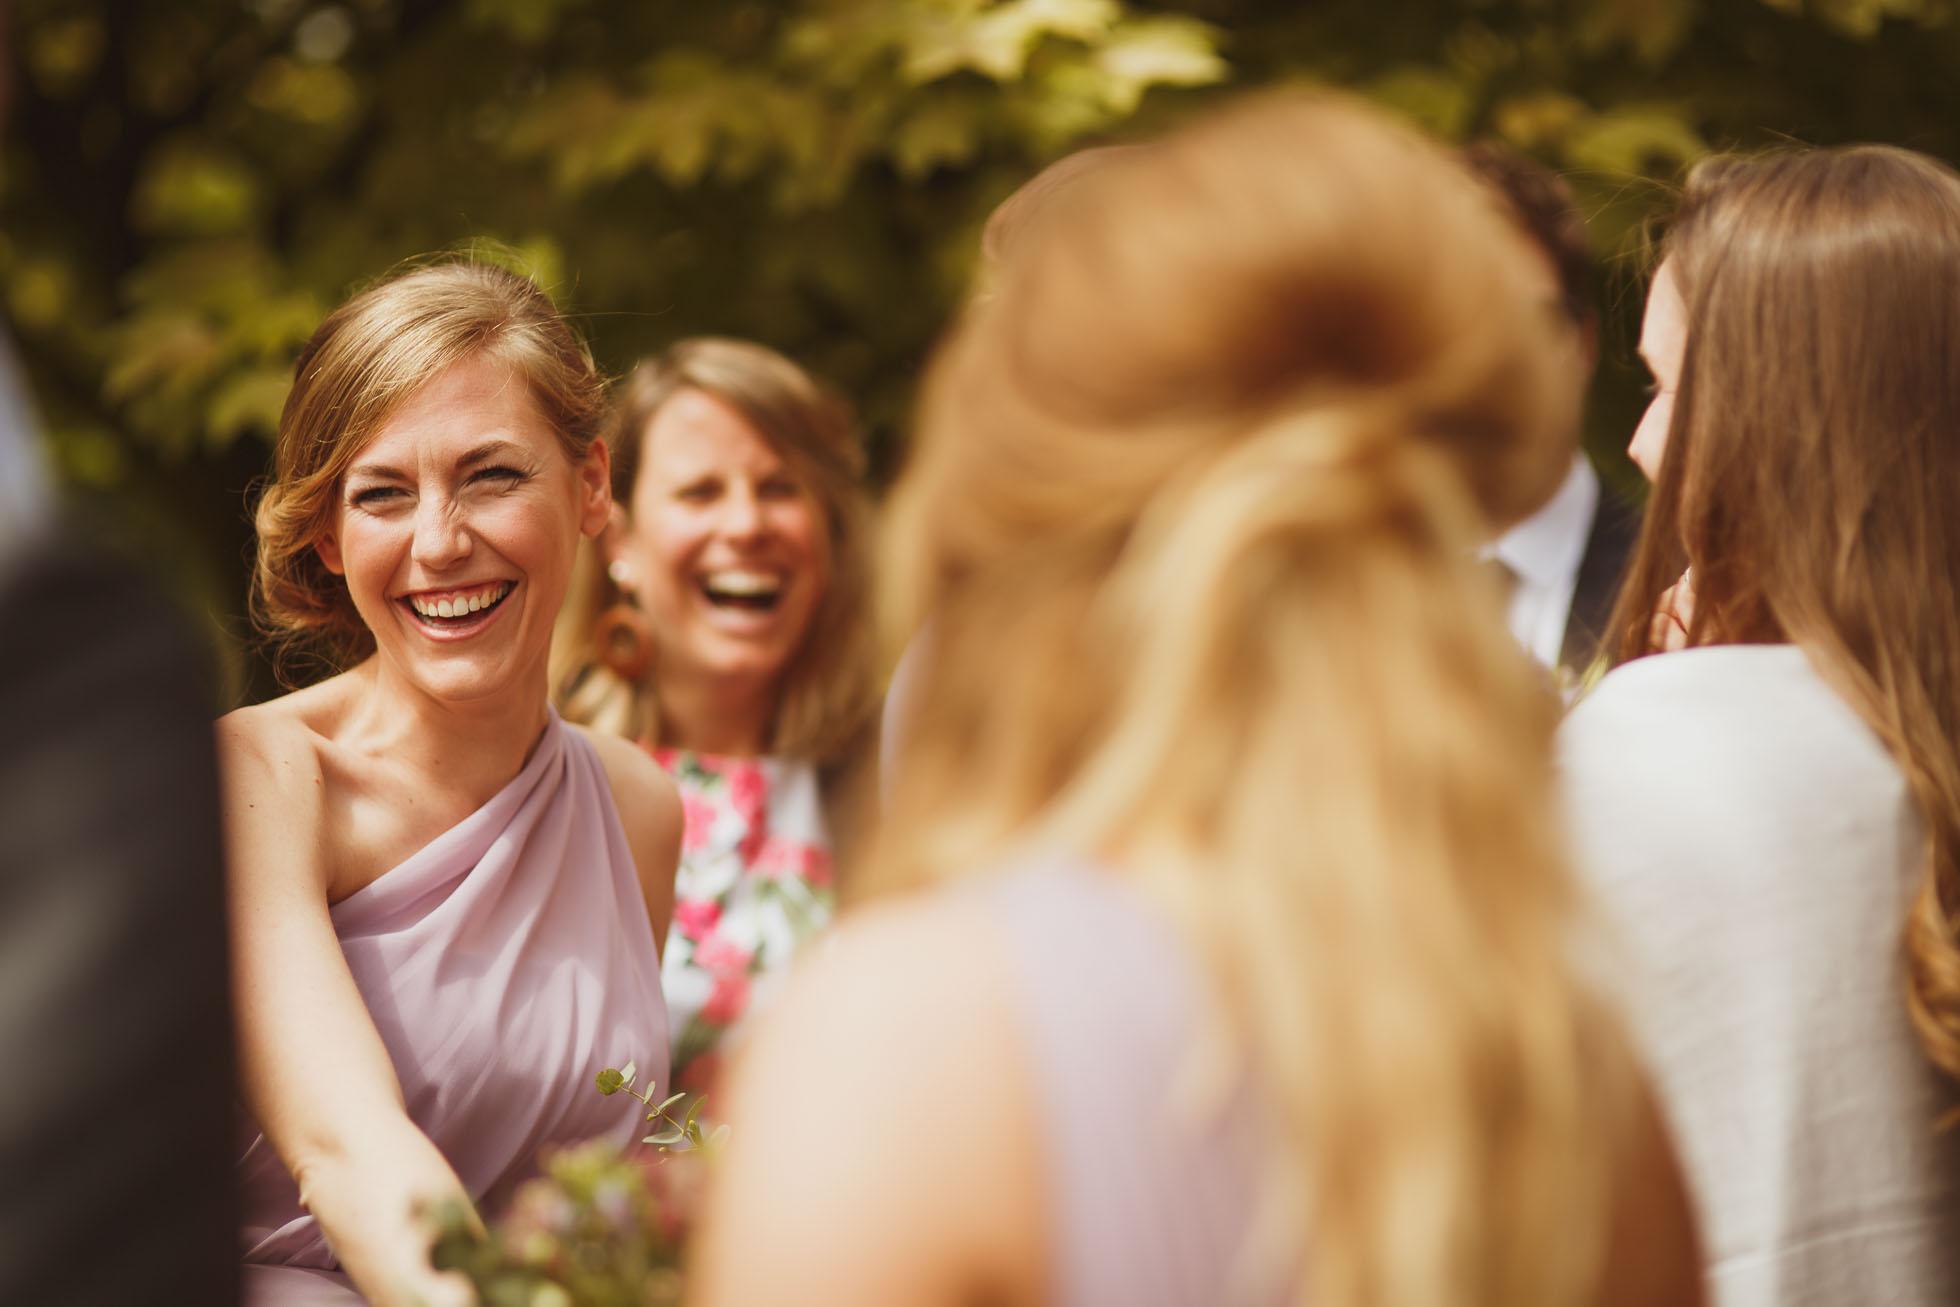 denton-hall-wedding-photographer-35.jpg